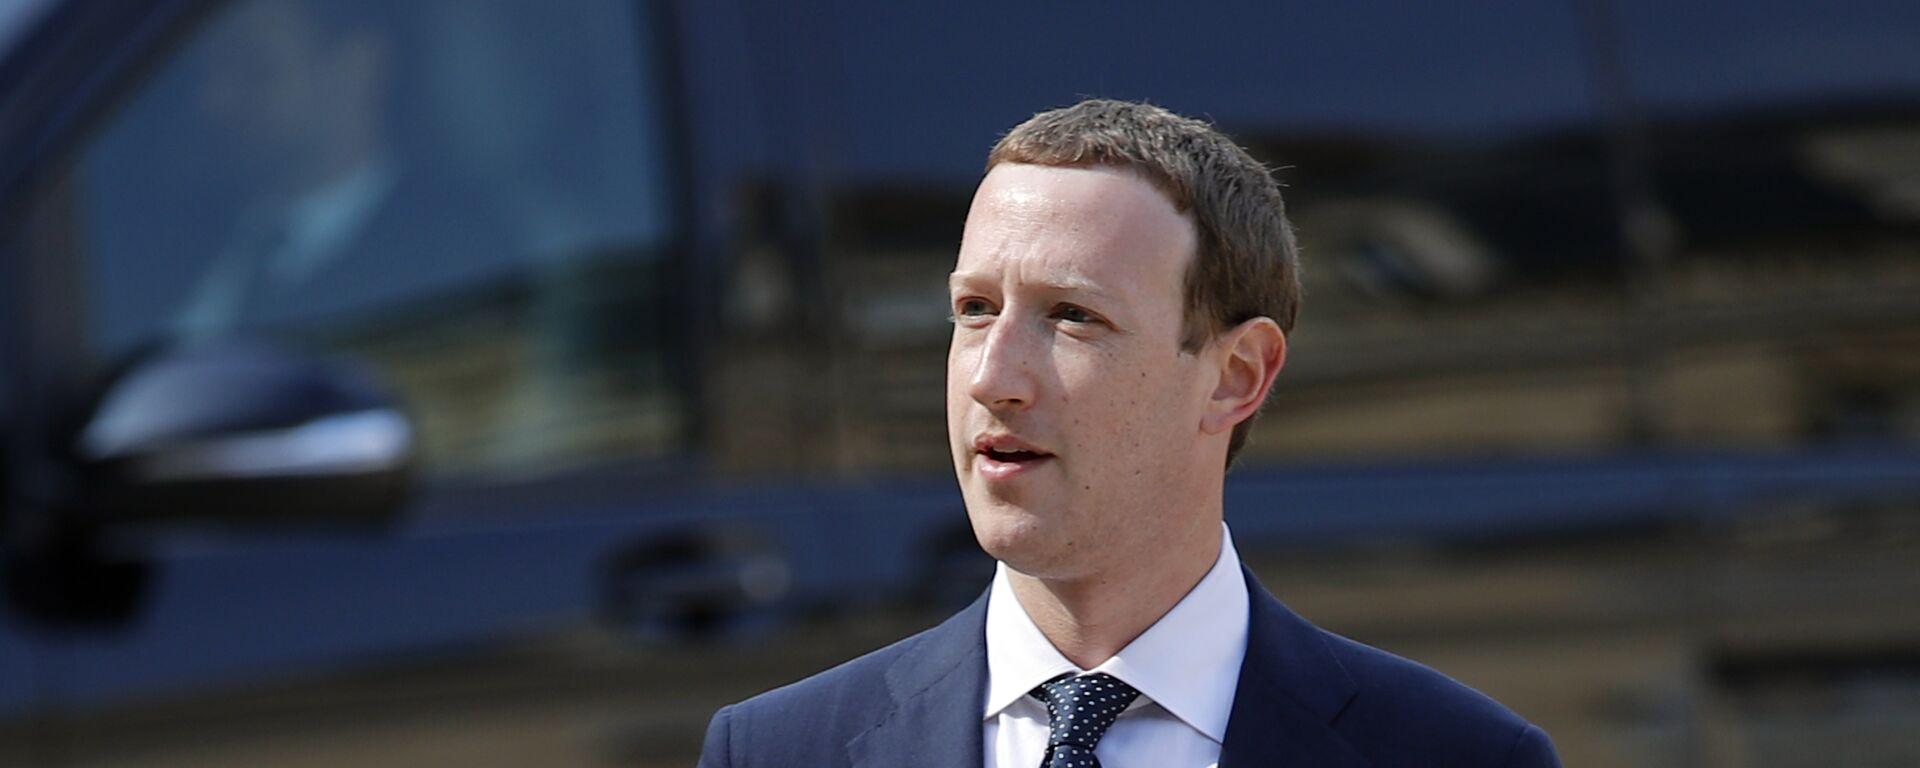 CEO di Facebook Mark Zuckerberg - Sputnik Italia, 1920, 19.07.2021